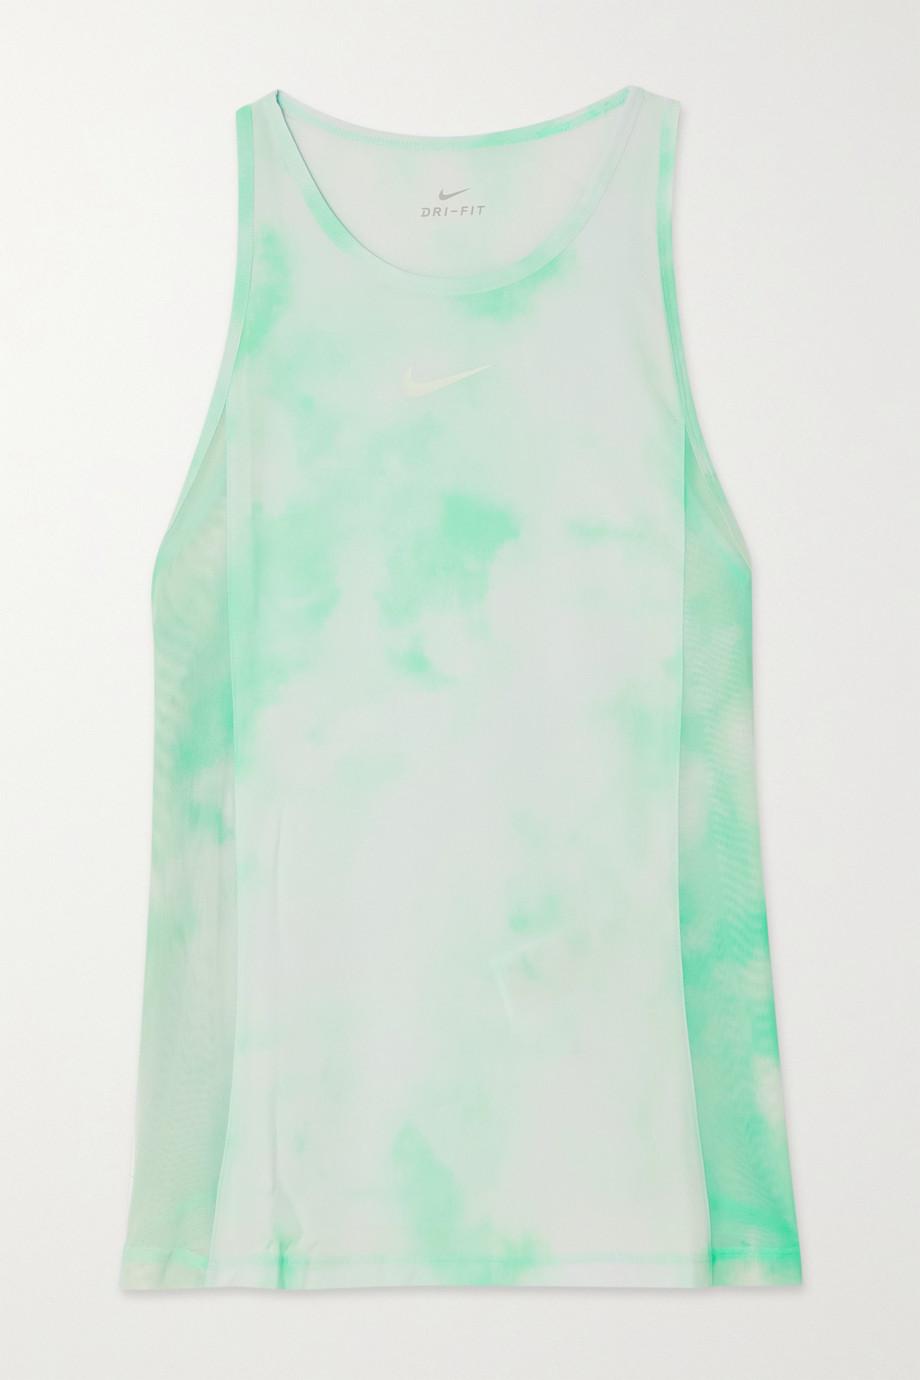 Nike Icon Clash City Sleek mesh-paneled tie-dyed Dri-FIT tank